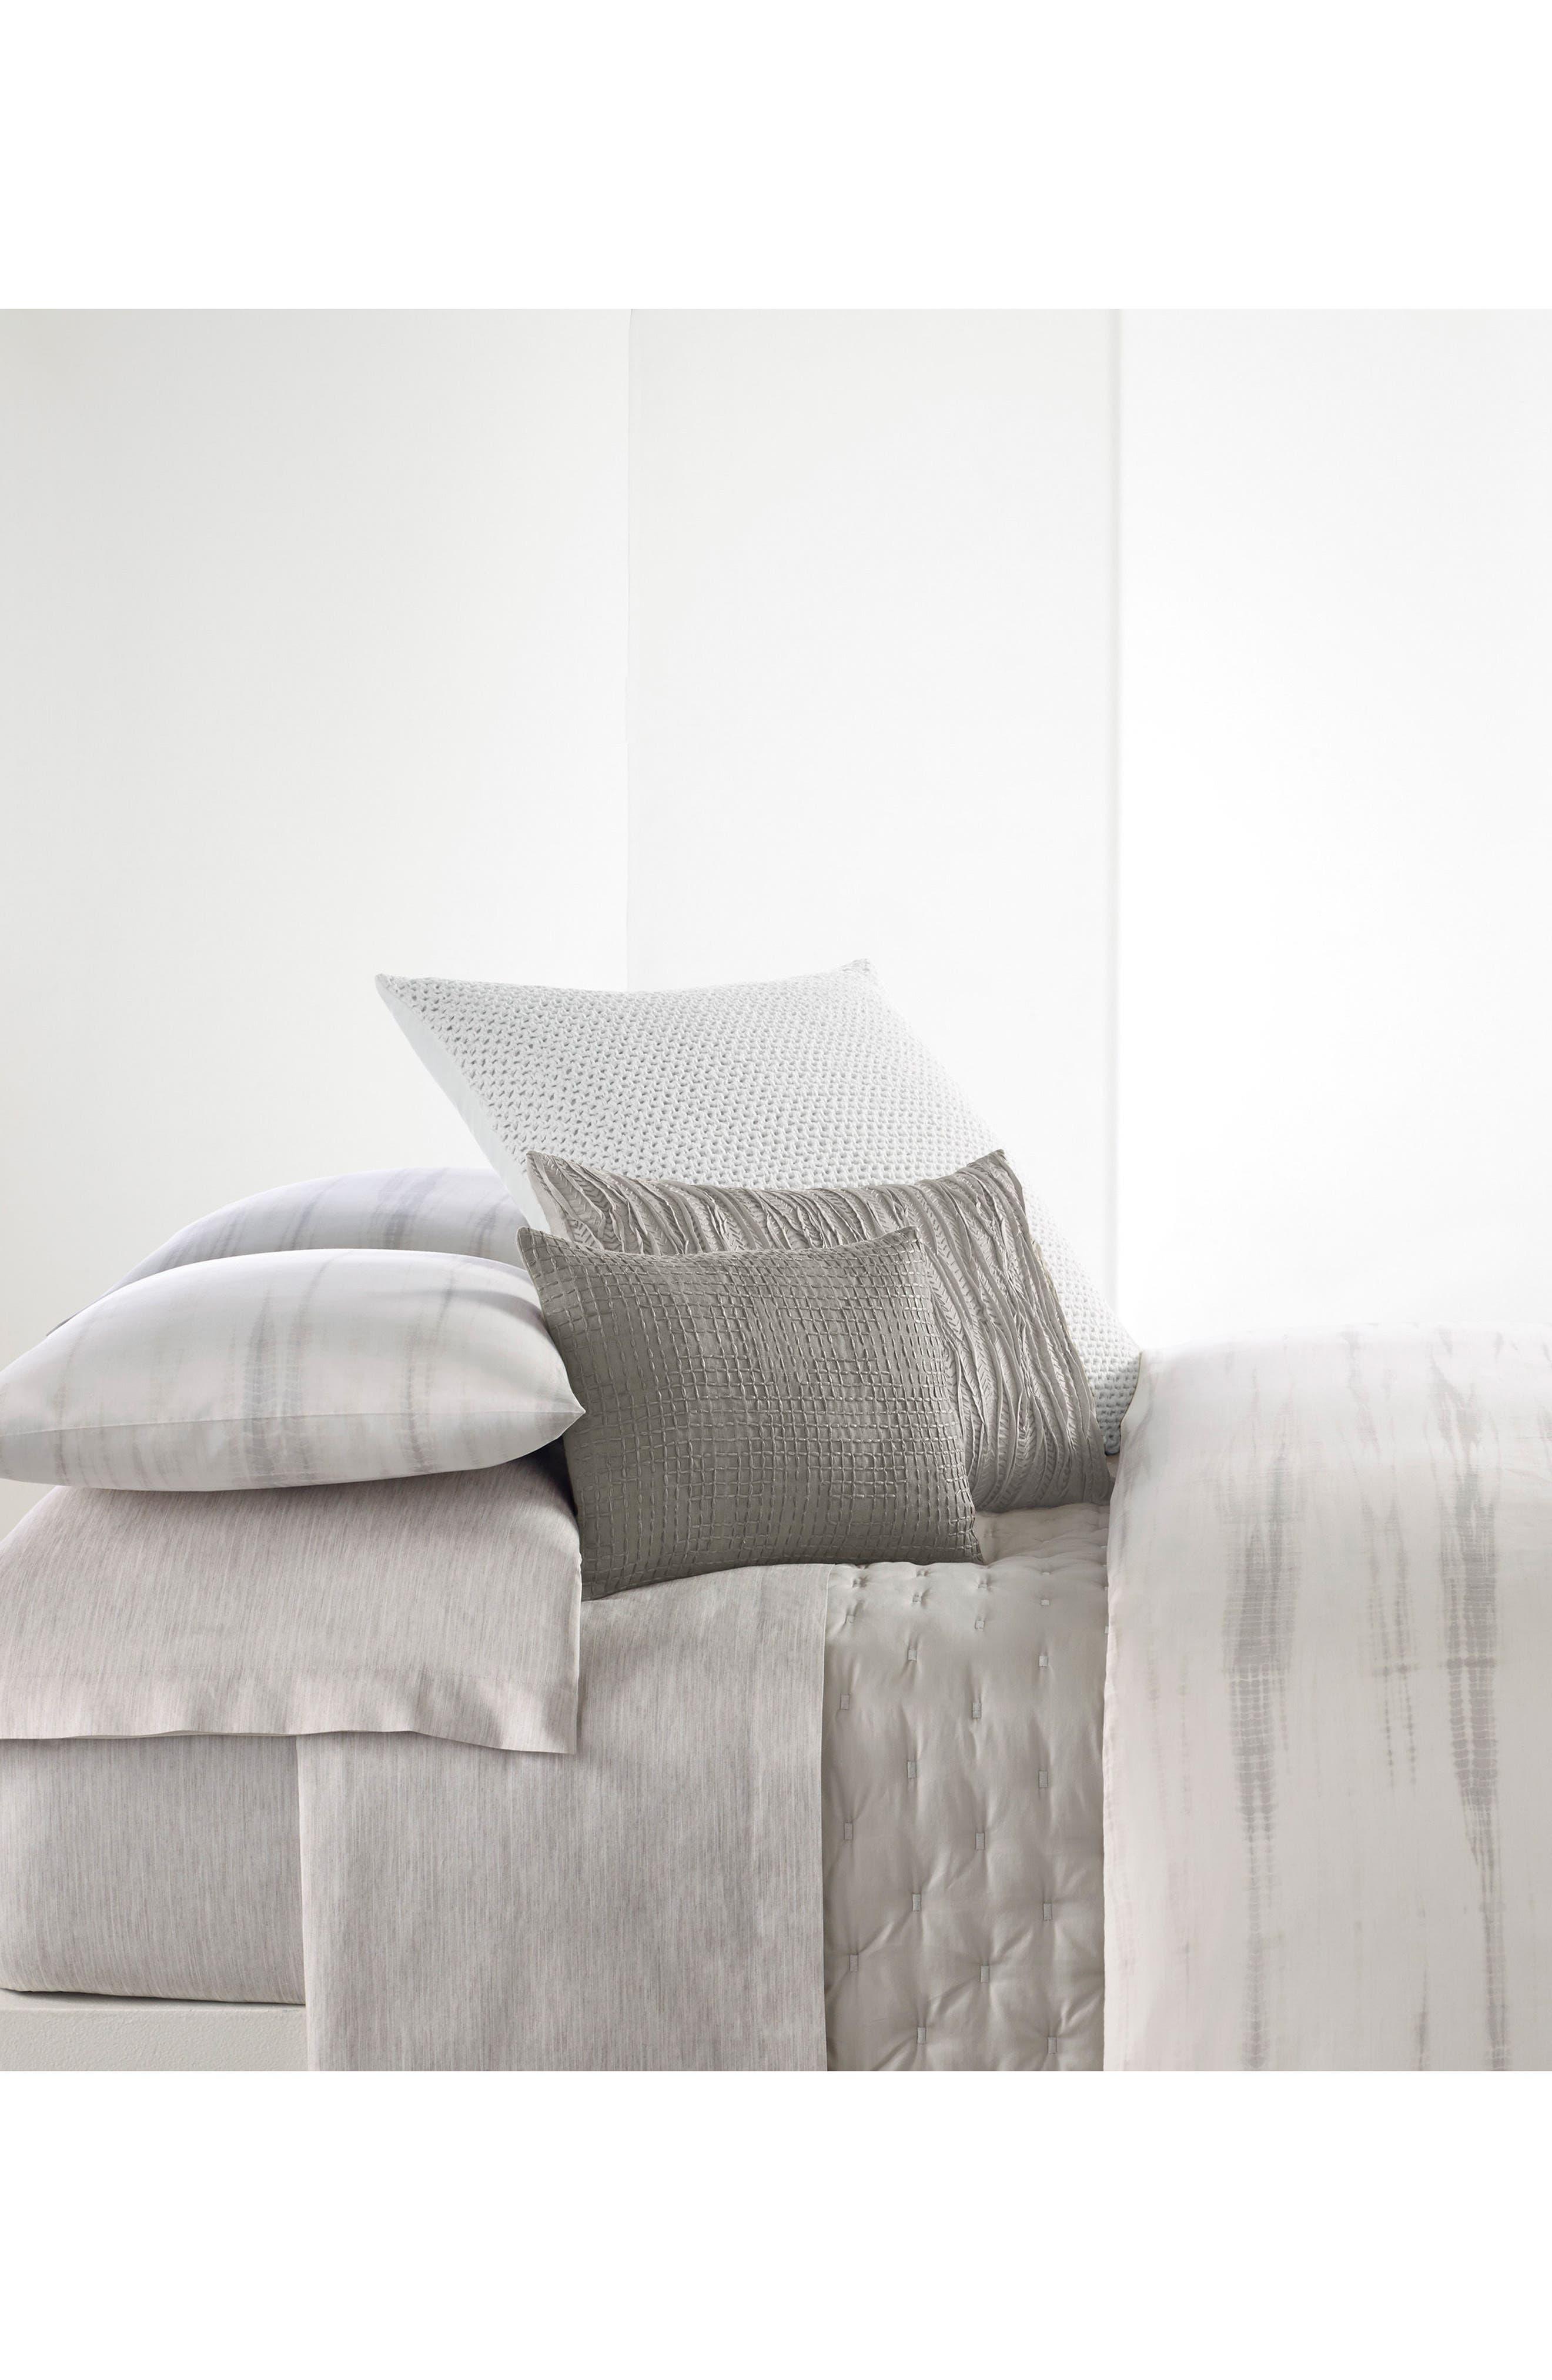 Marble Shibori 350 Thread Count Duvet Cover,                         Main,                         color,